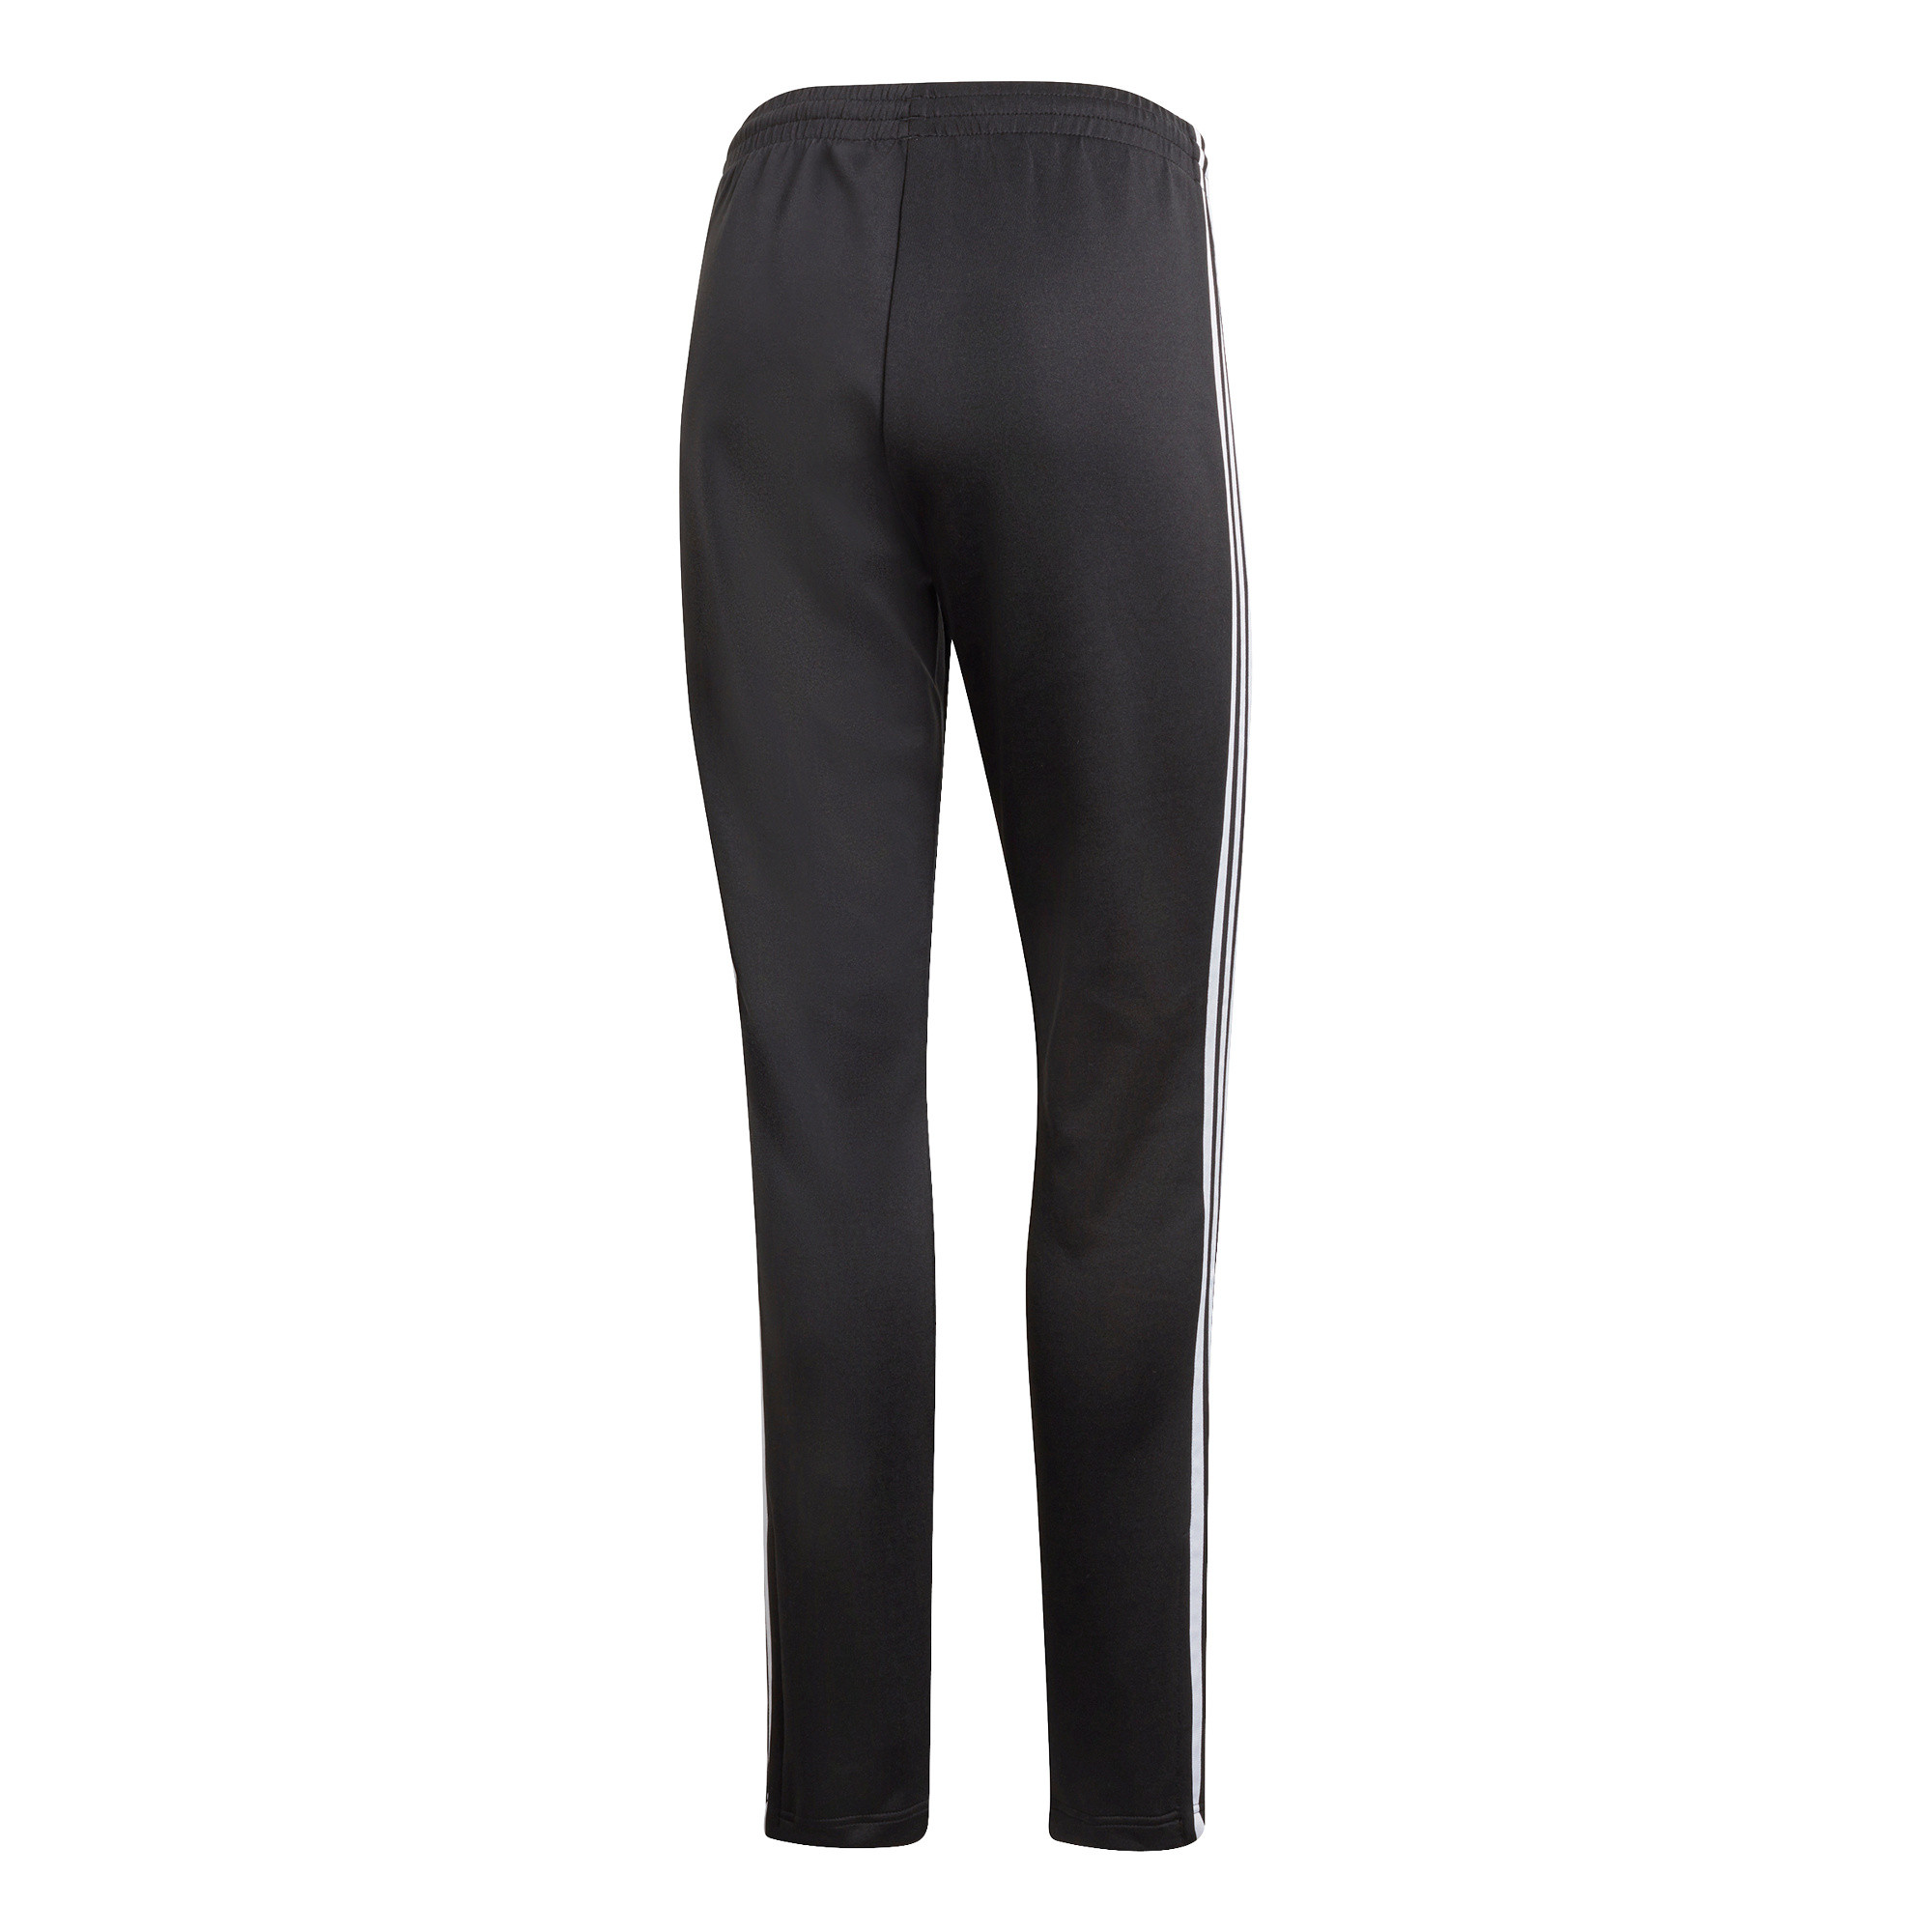 Pantaloni tuta Primeblue SST, Bianco/Nero, large image number 7